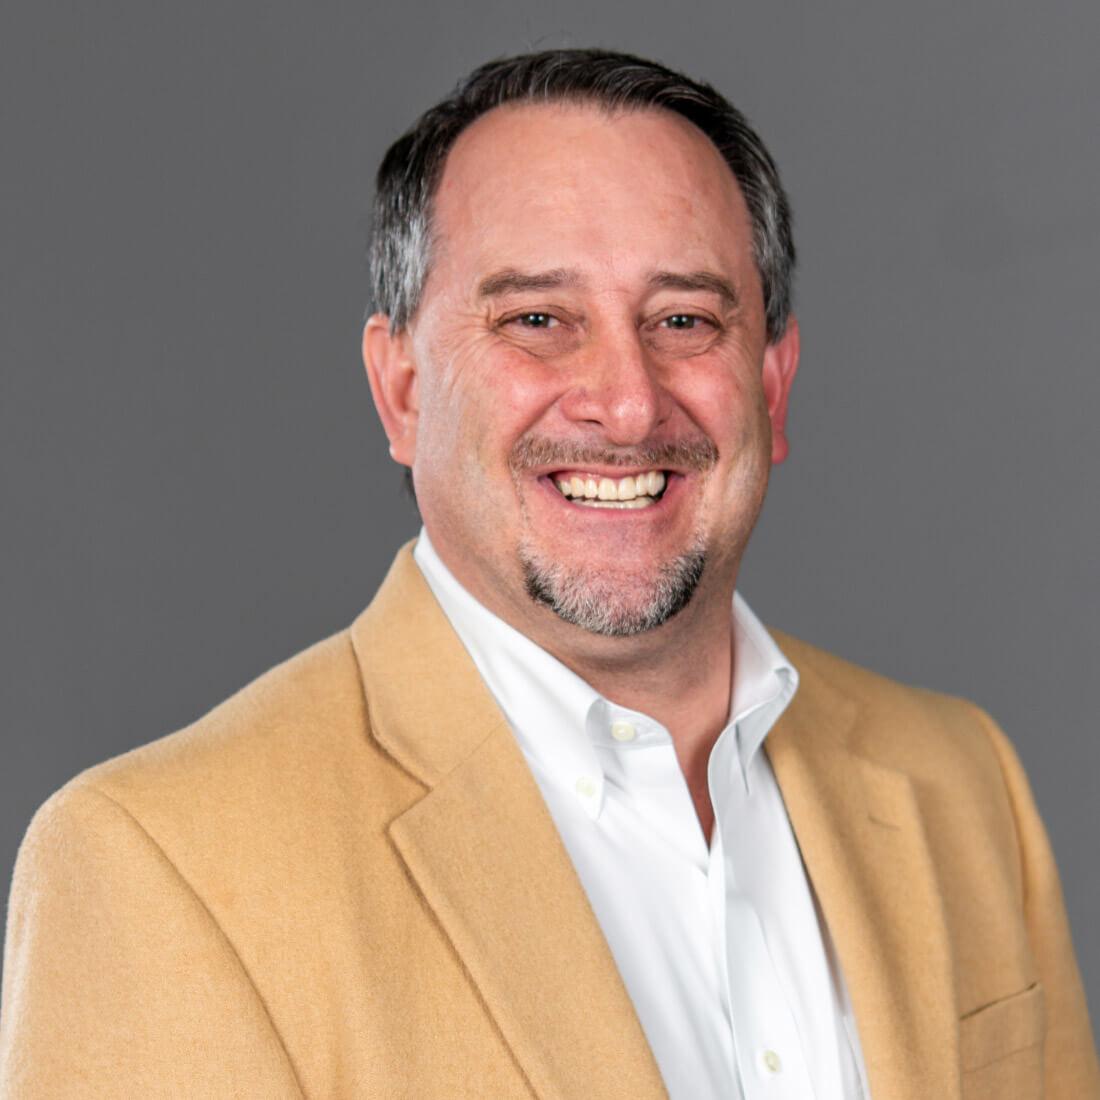 Chris Christian VP of Business Development